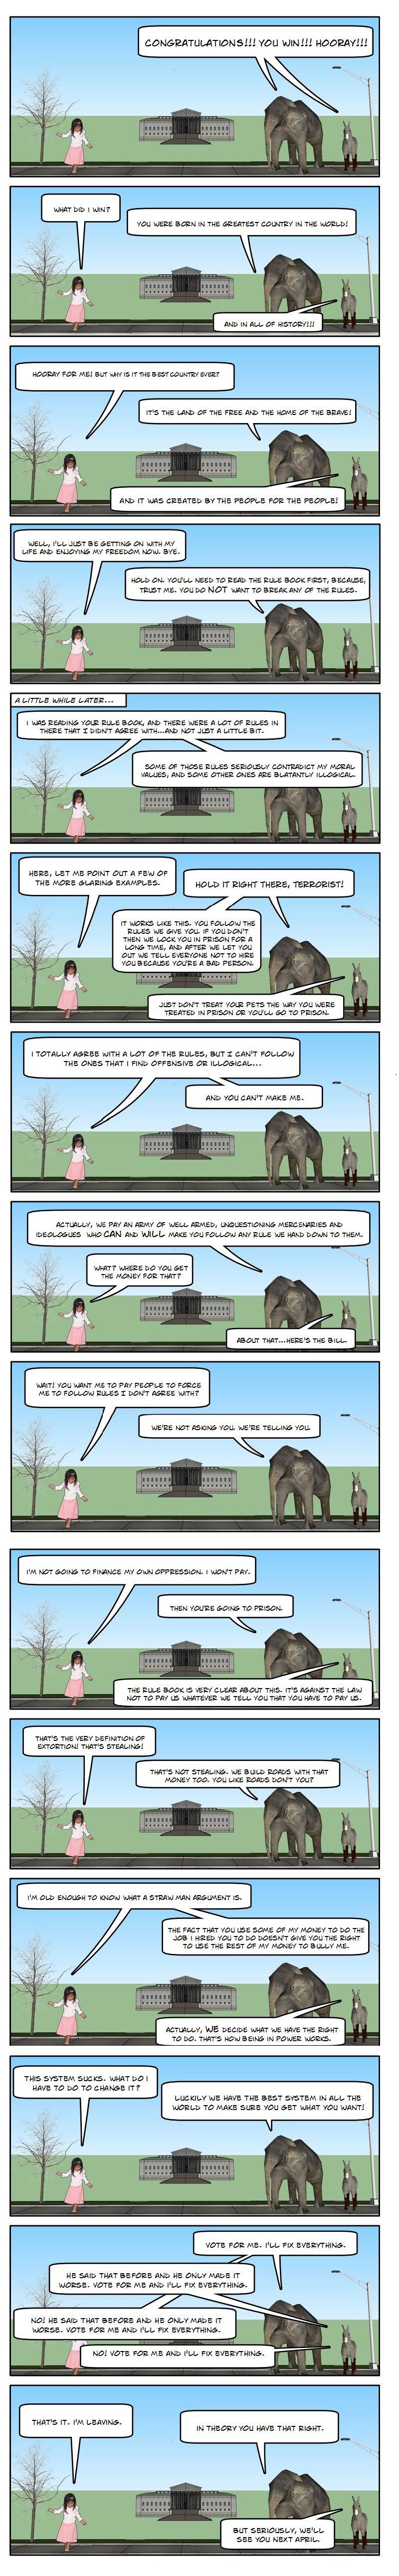 (Comic) How Freedom Works